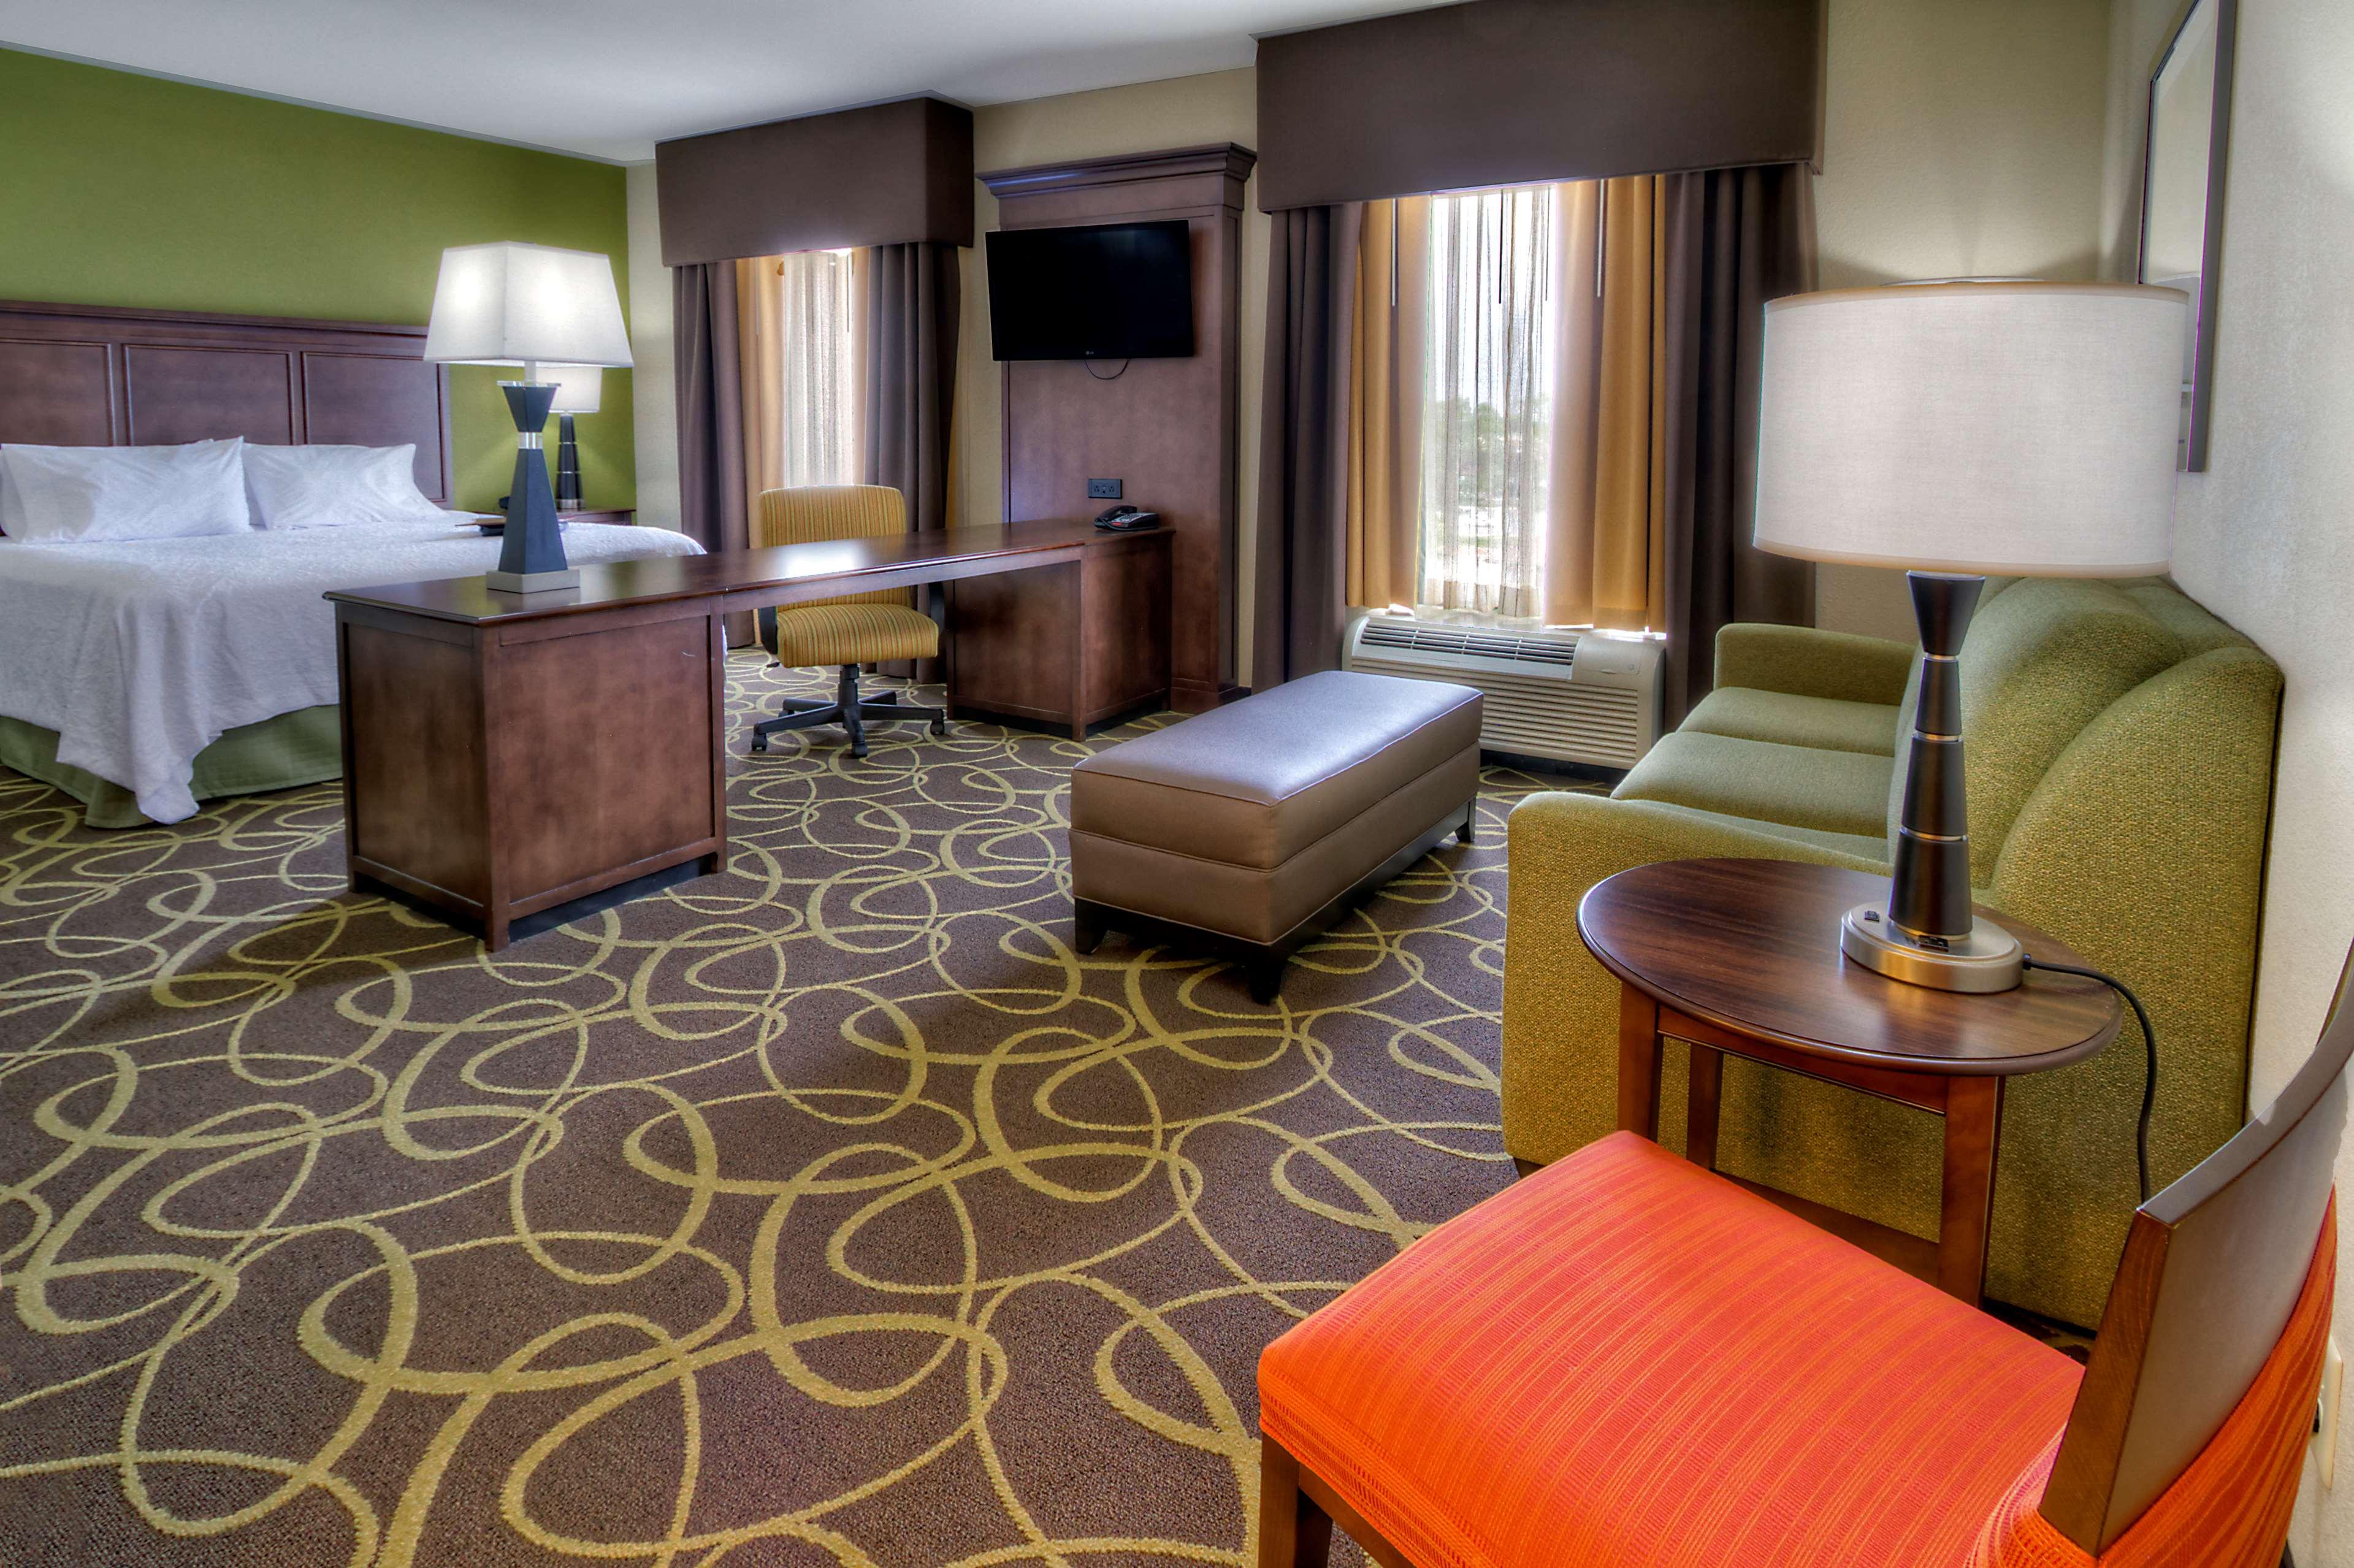 Hampton Inn & Suites Rochester/Henrietta image 22